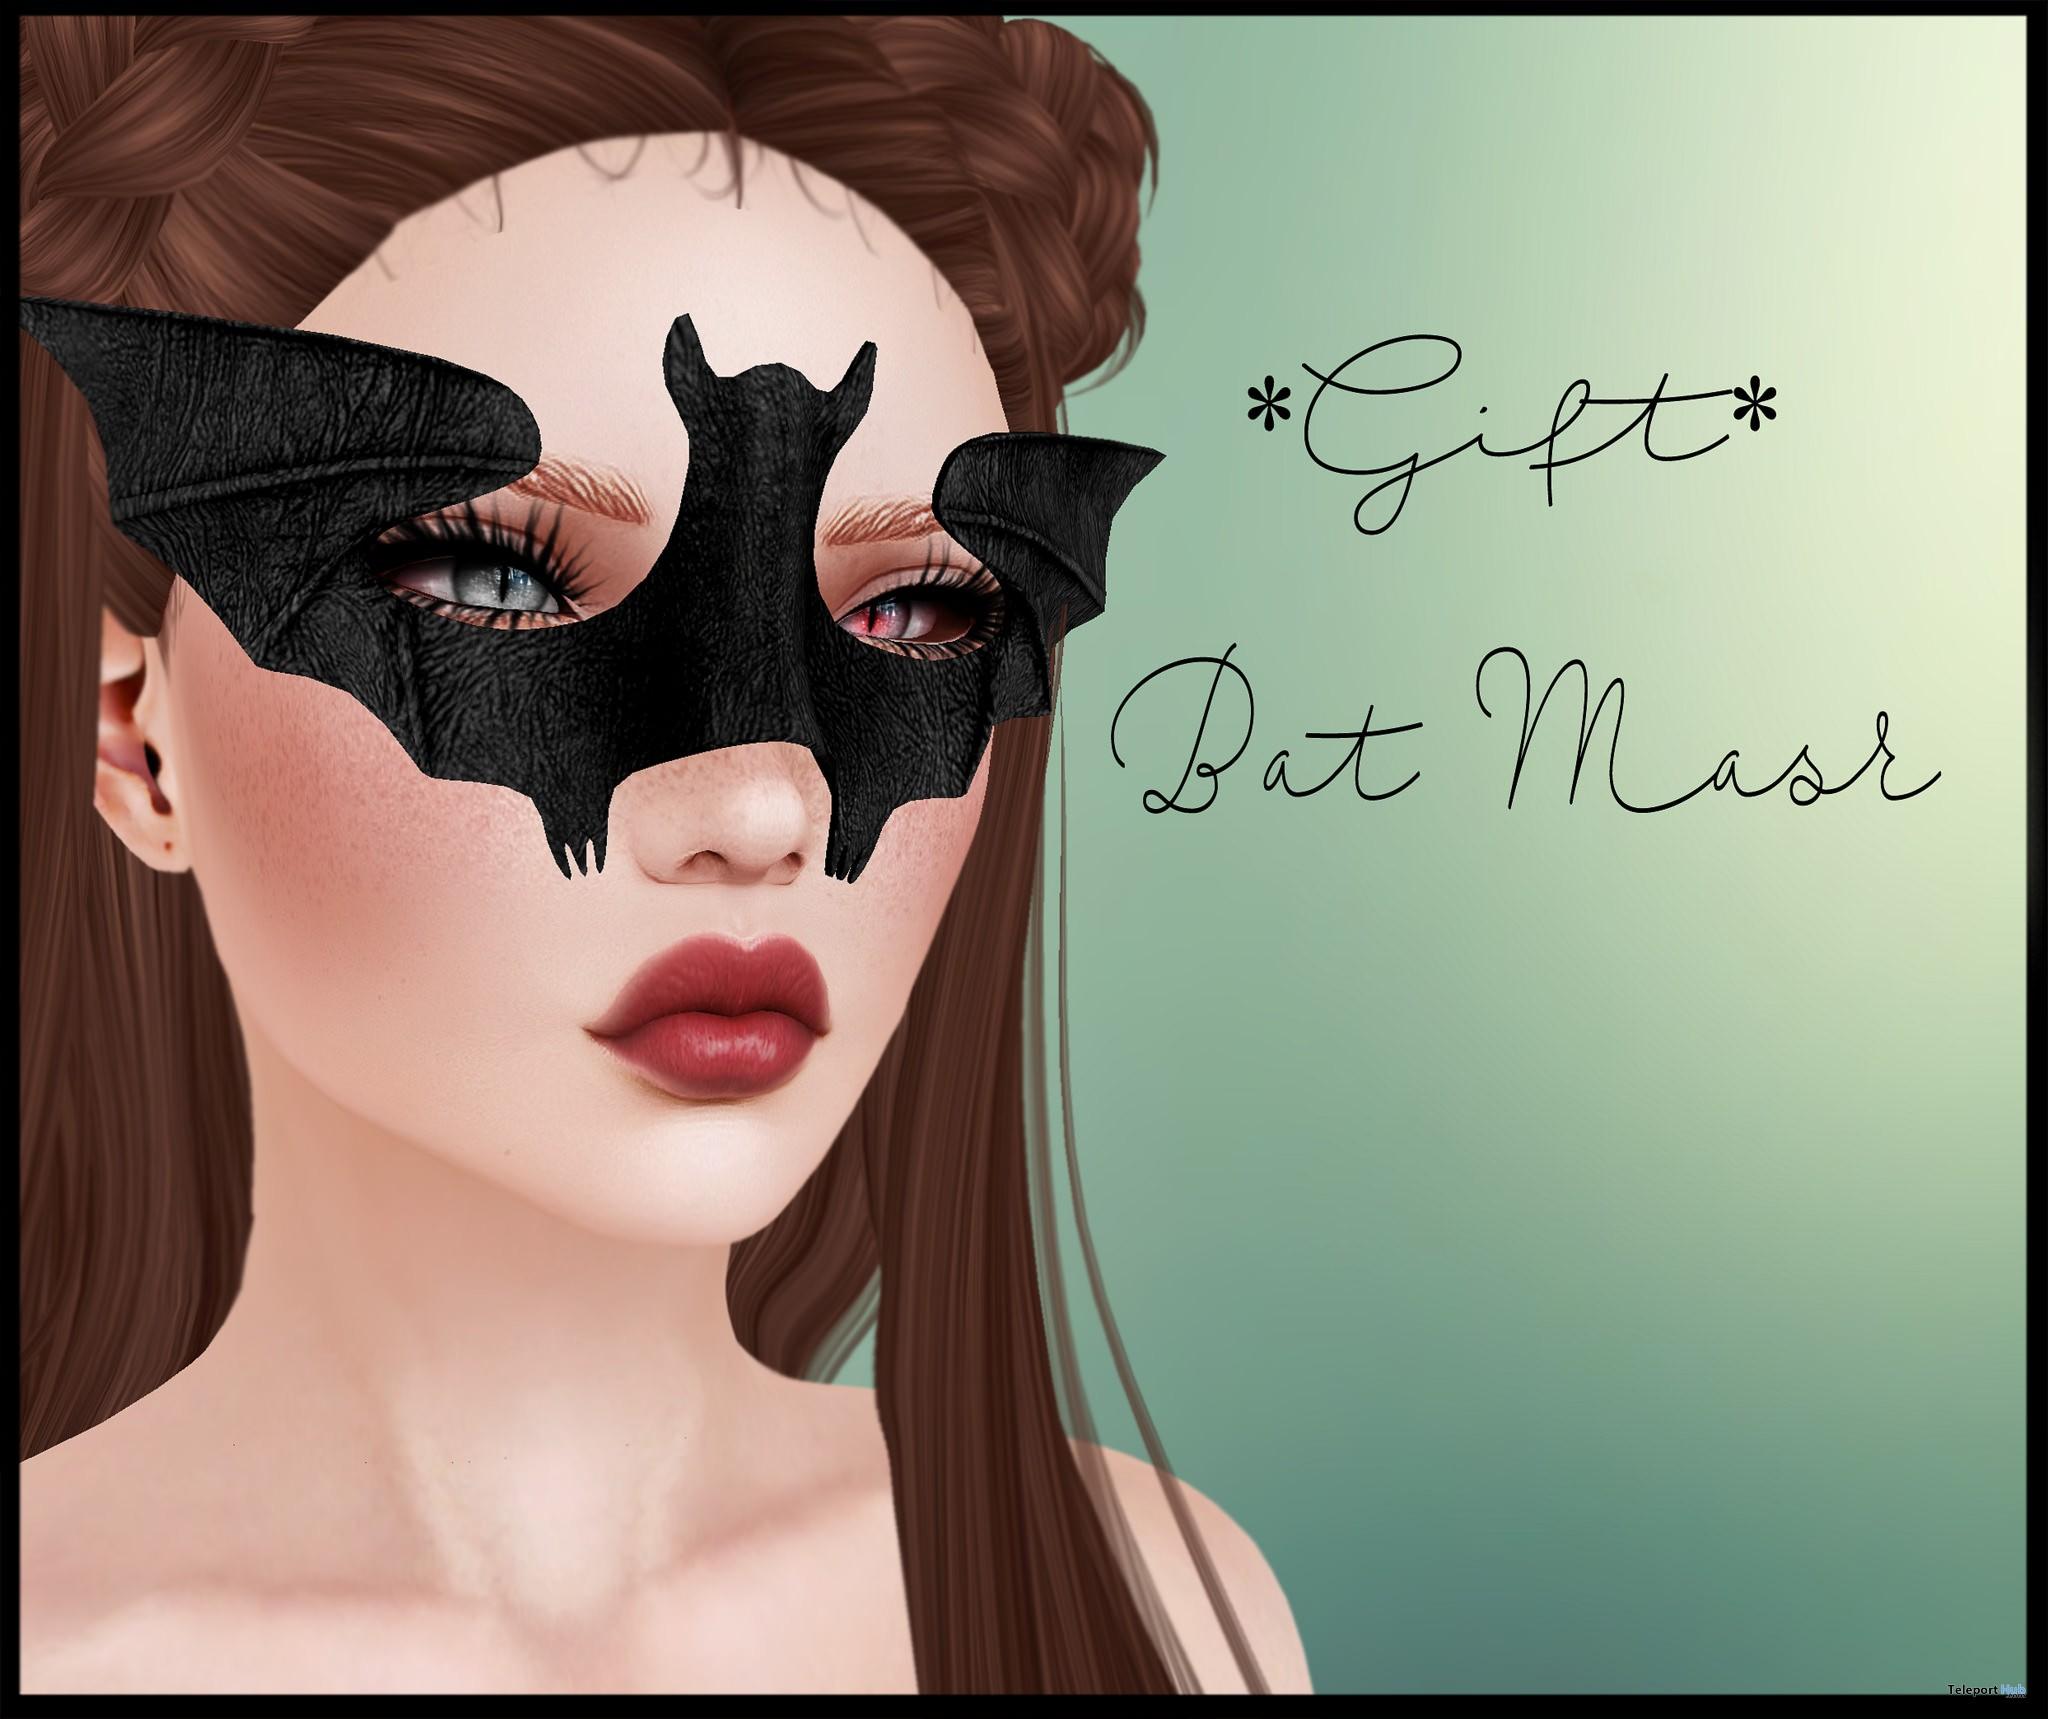 Bat Mask October 2016 Group Gift by Viki - Teleport Hub - teleporthub.com